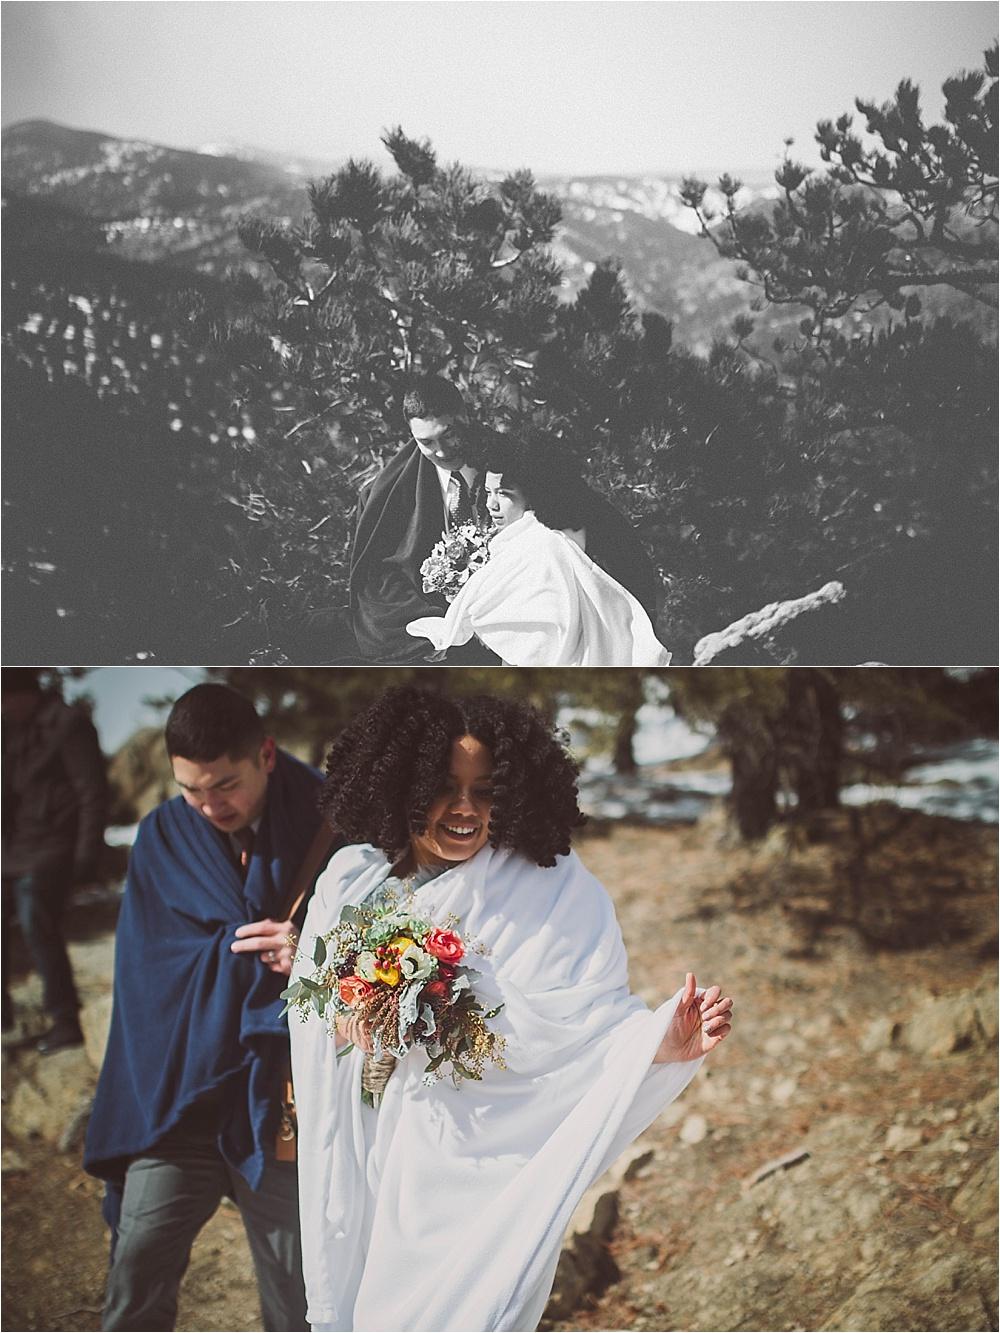 manzanita photo by rebecca caridad wedding lifestlye photography floral design calligraphy_1219.jpg